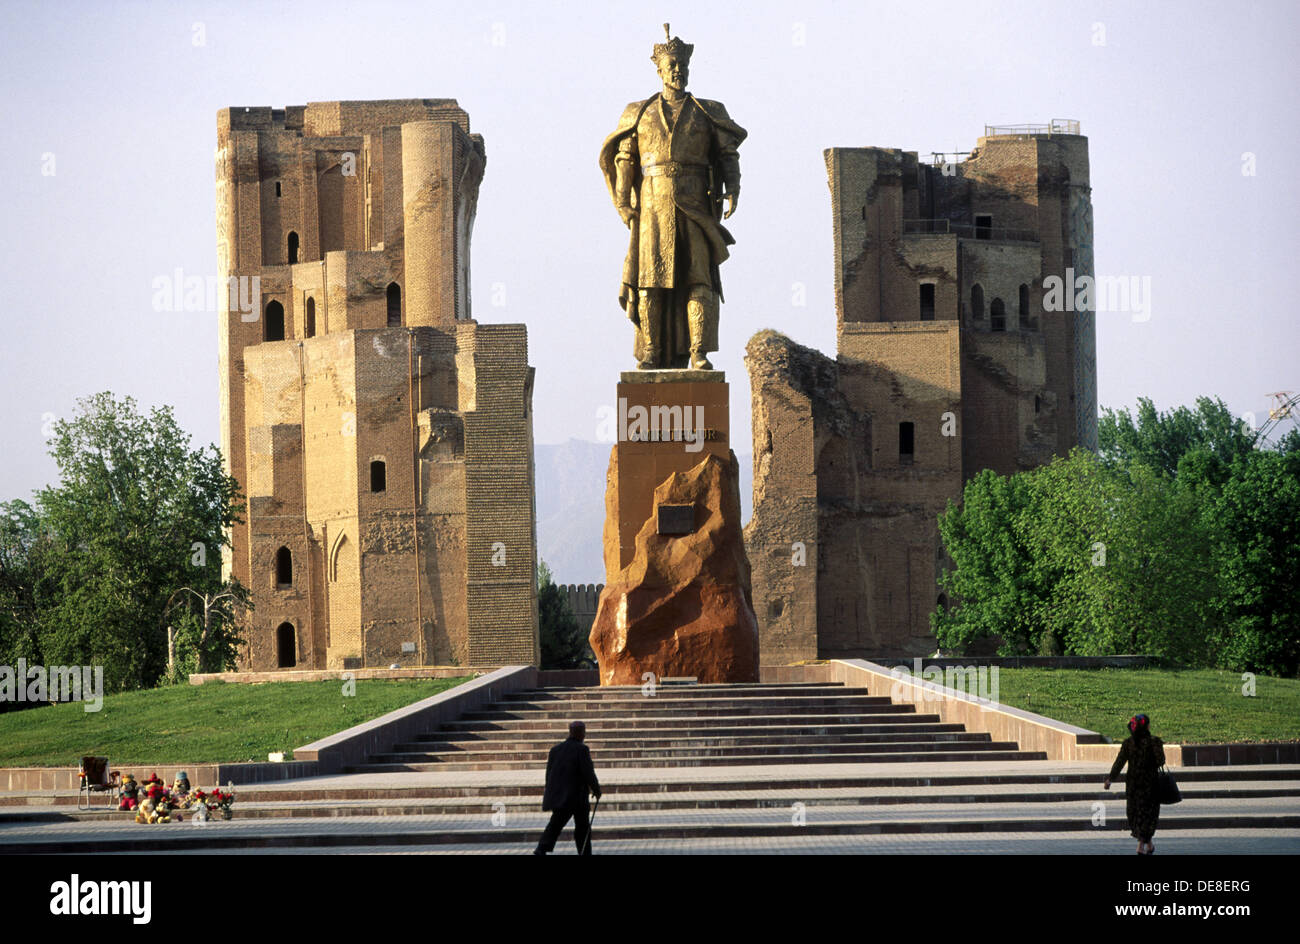 Statue of Amir Timur (Tamerlane), Turkic conqueror, and Ak-Saray Palace. Shakrisabz. Uzbekistan - Stock Image